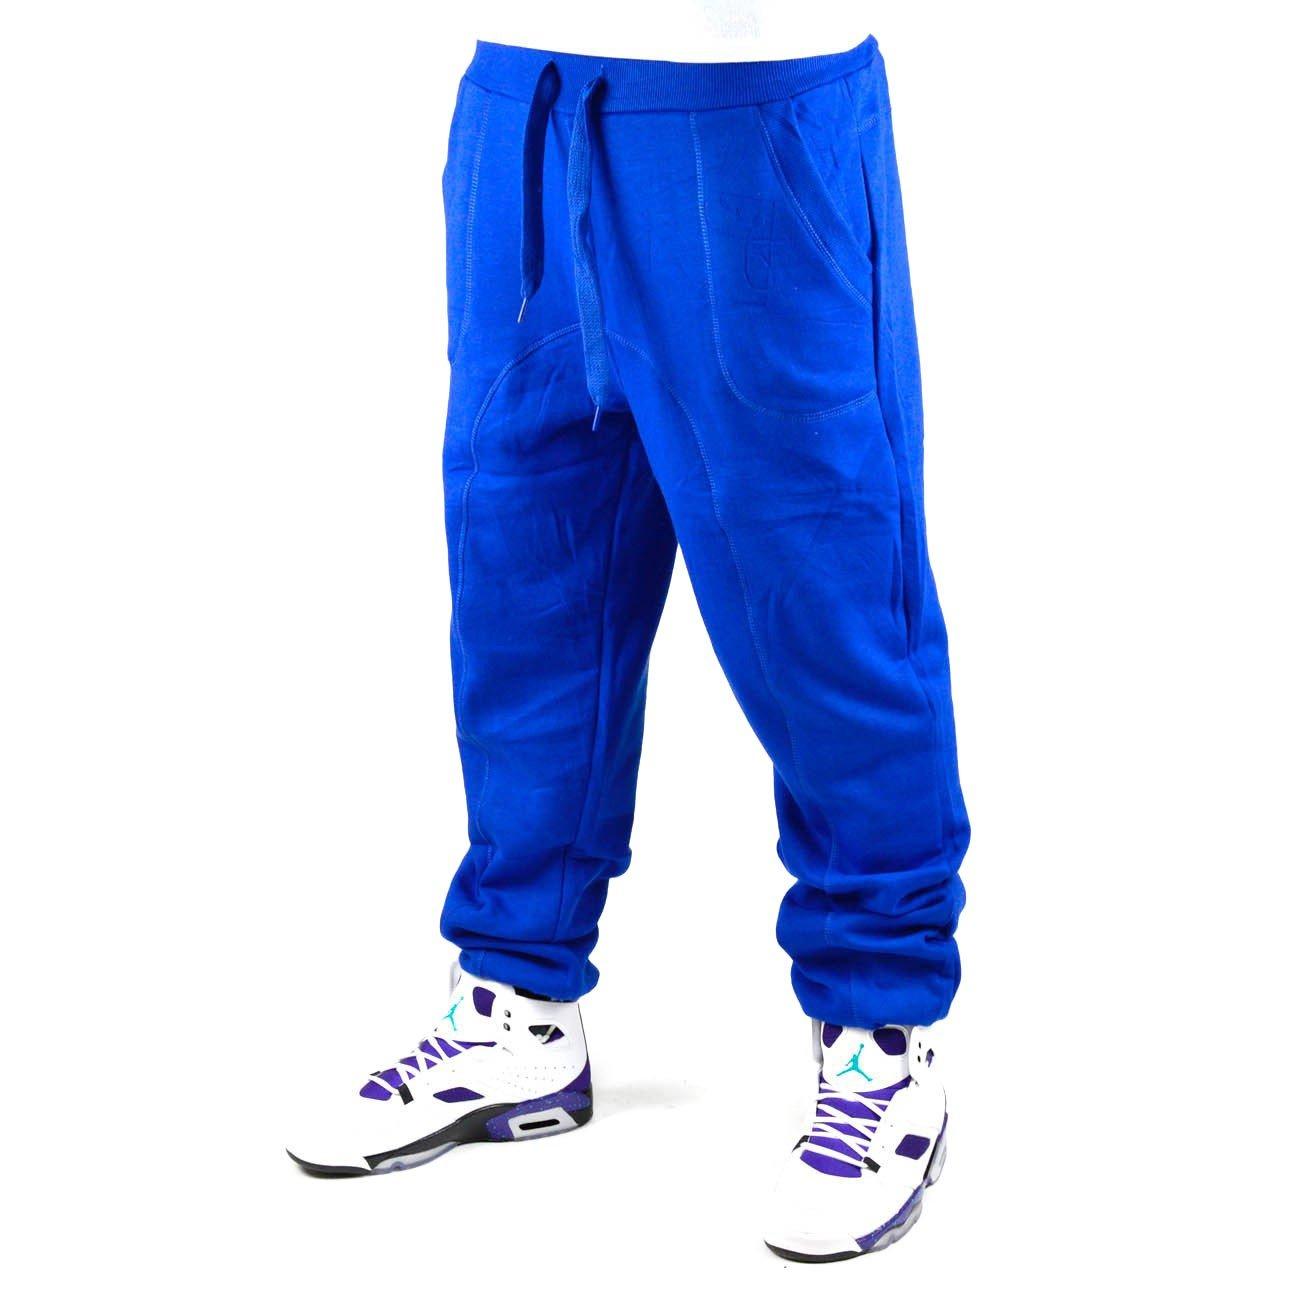 Pantaloni della tuta Uomo ID534 (vari colori)